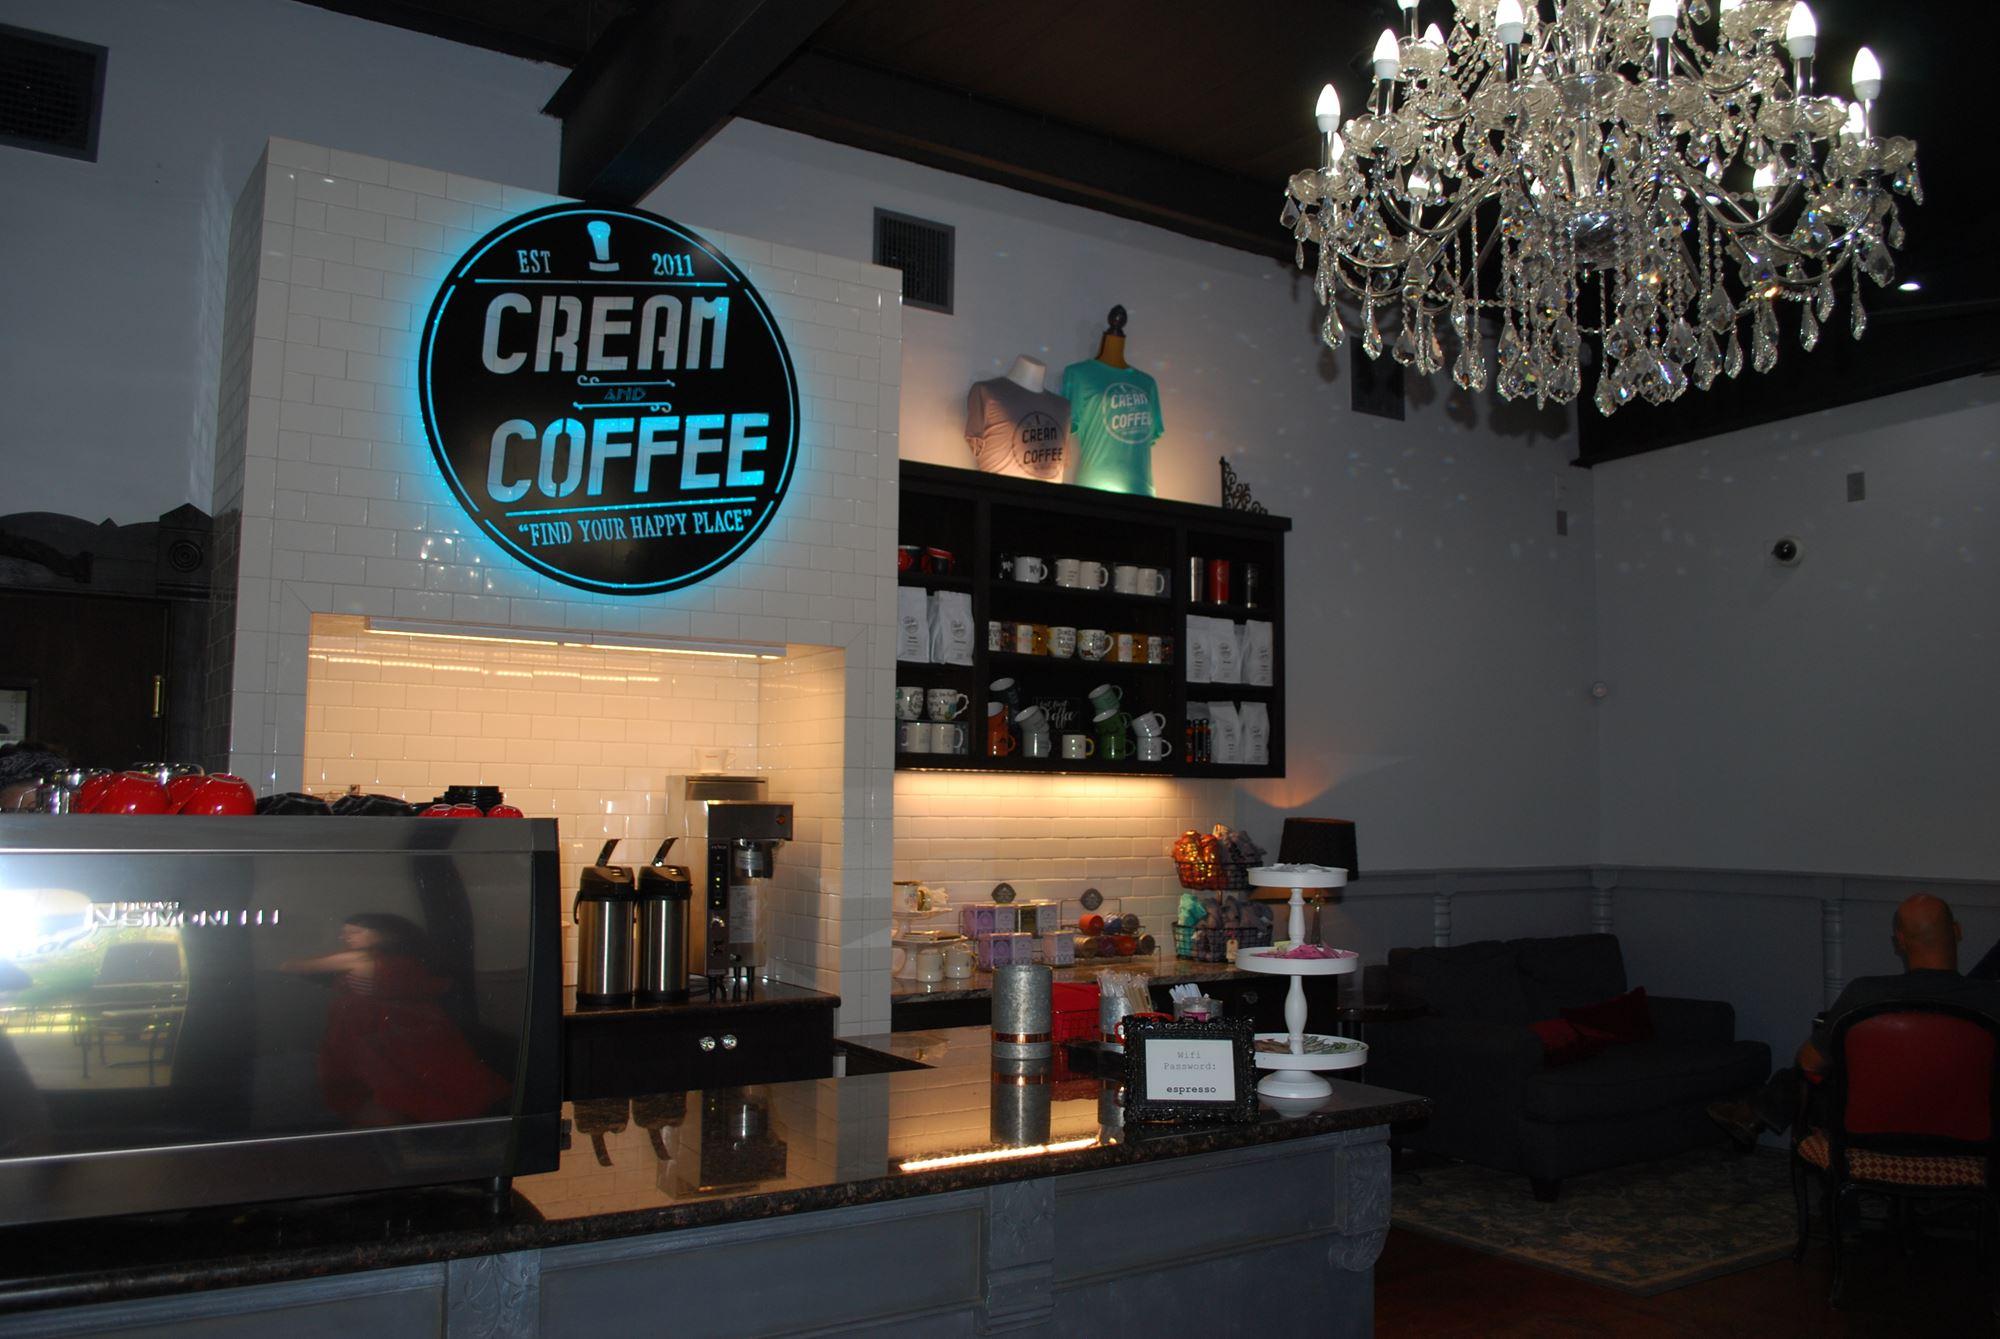 Cream & Coffee